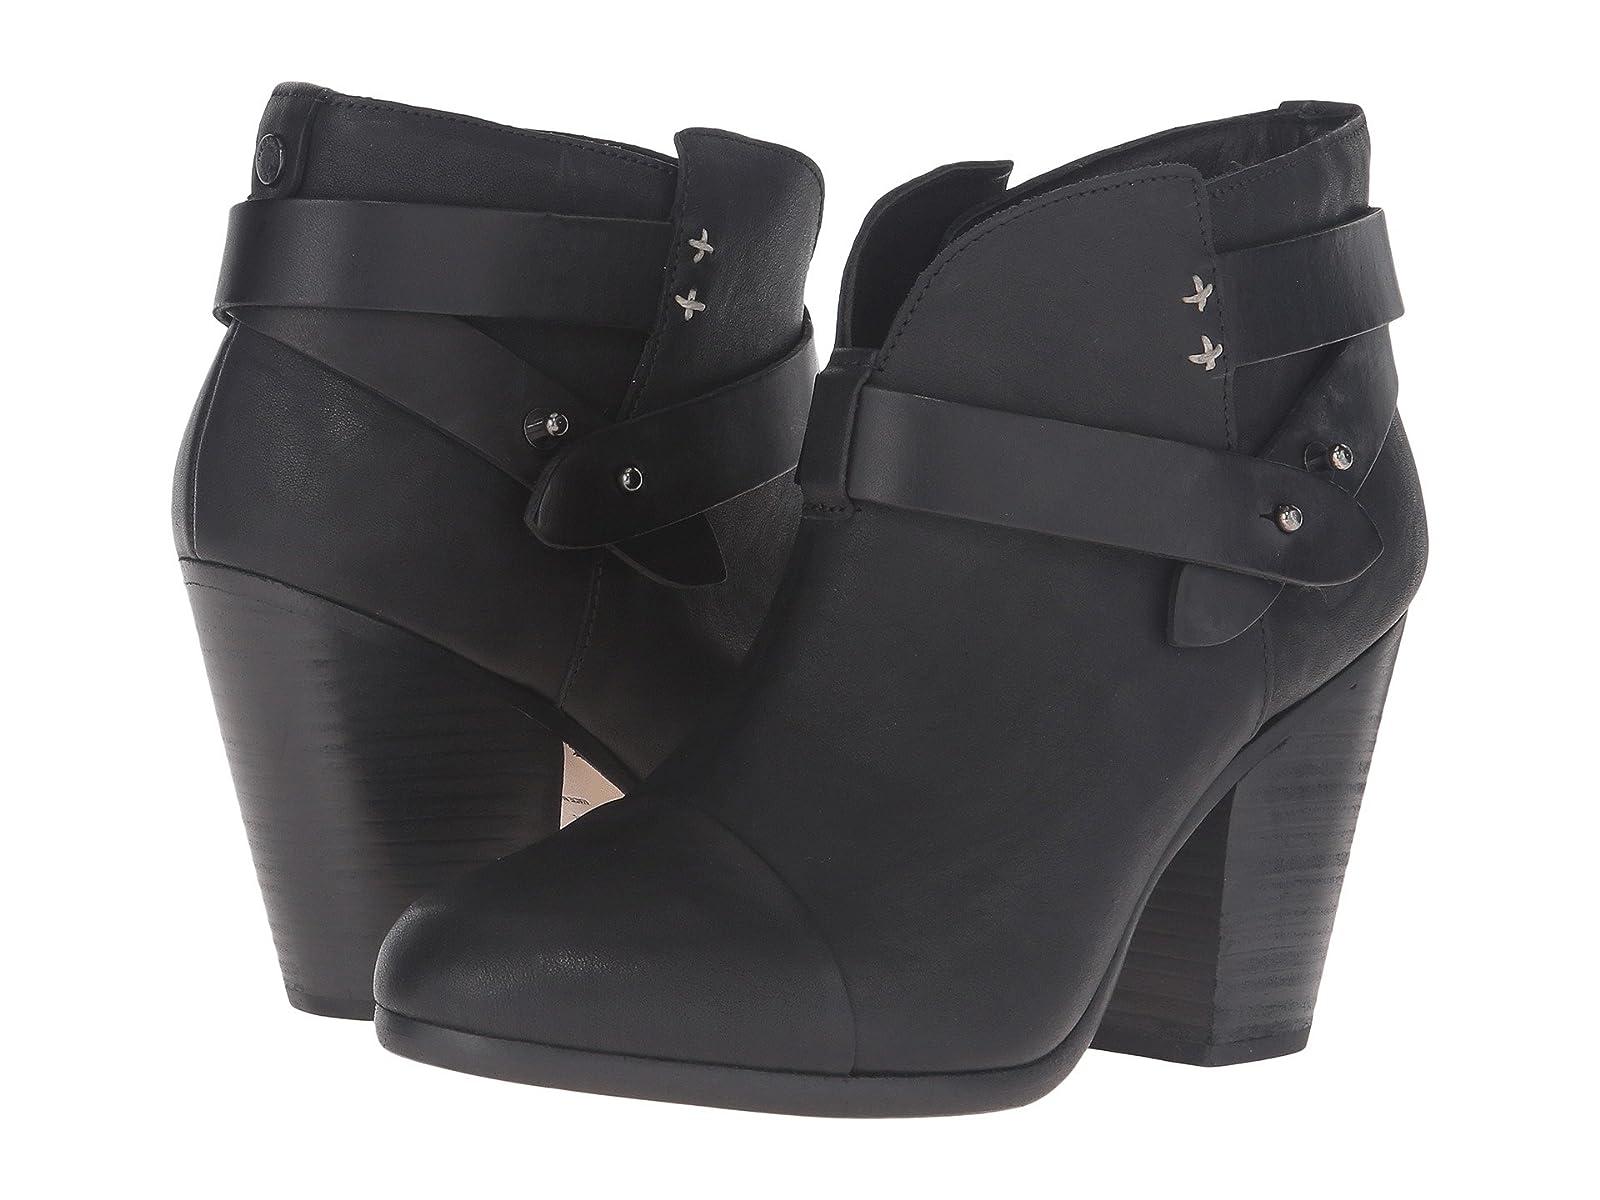 rag & bone Harrow BootEconomical and quality shoes